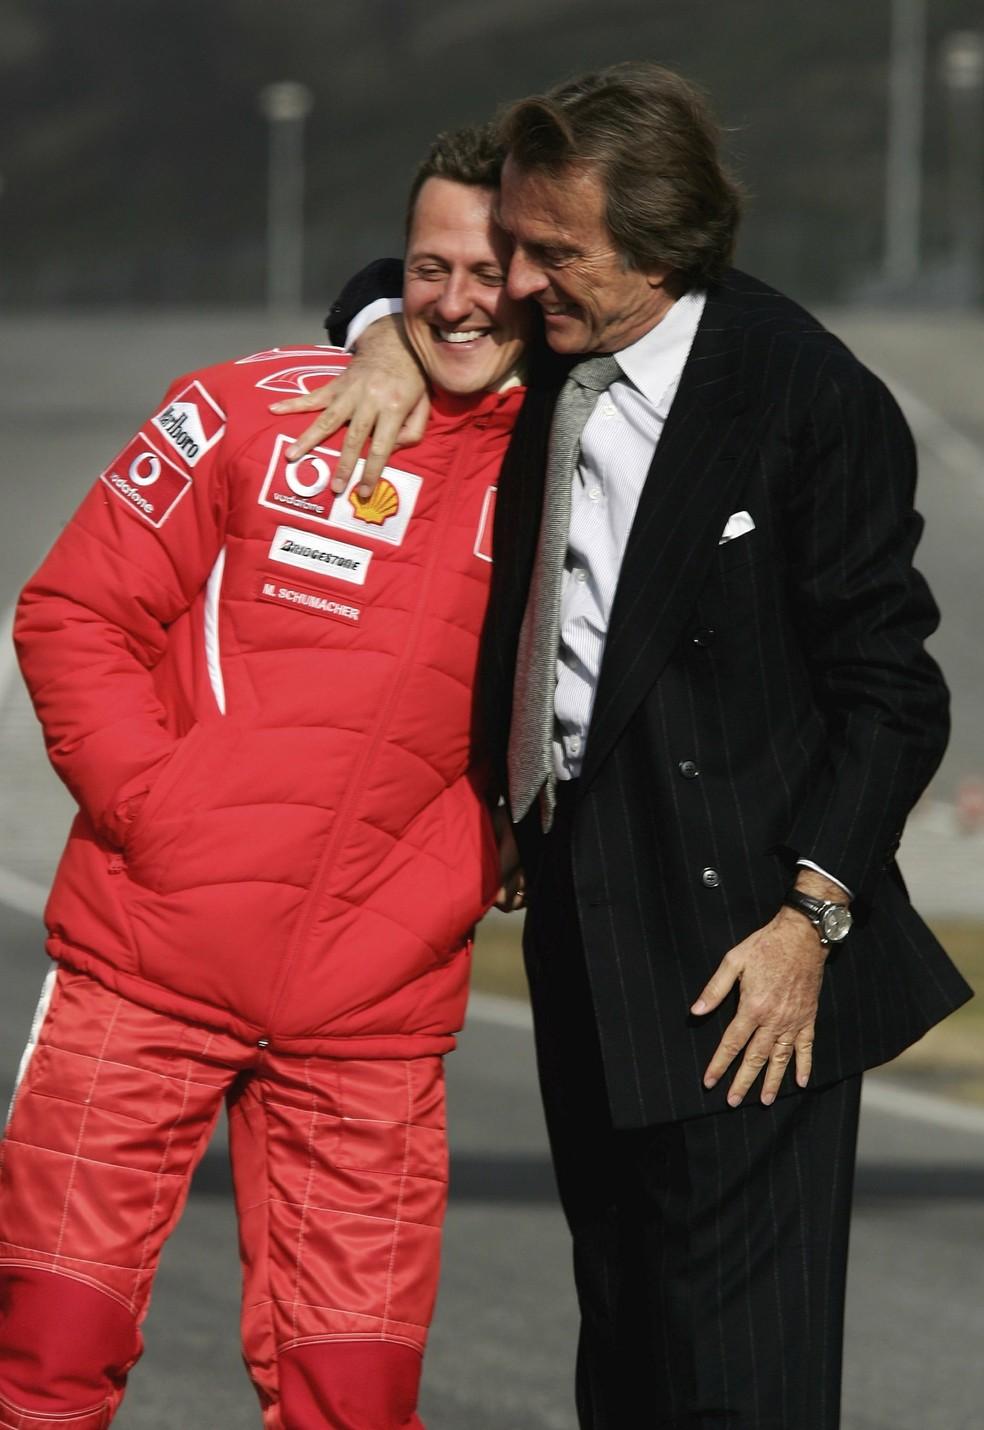 Michael Schumacher e Luca di Montezemolo em 2006 — Foto: Getty Images